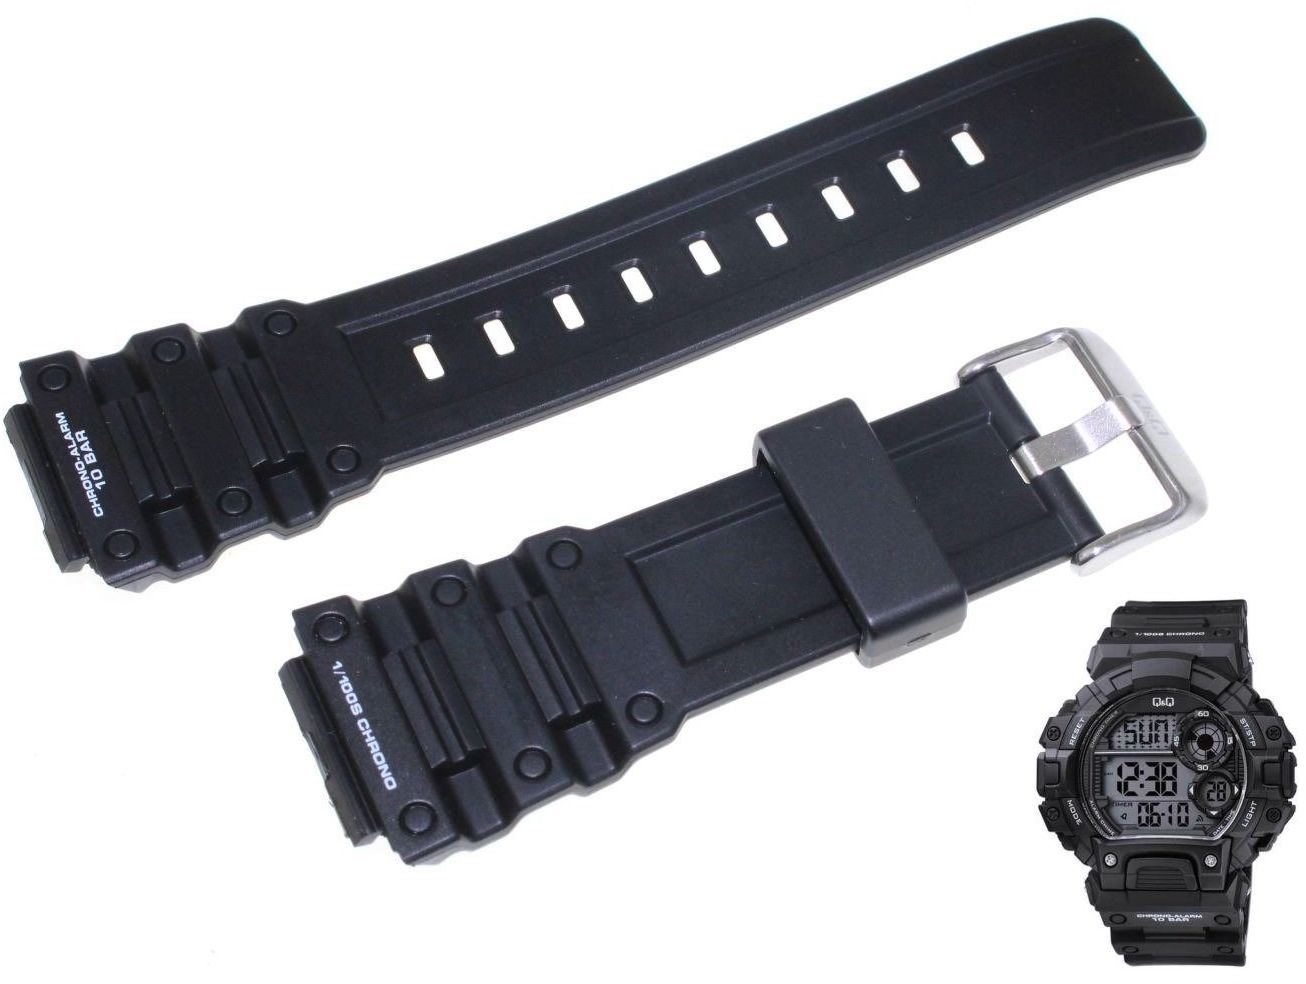 Pasek do zegarka Q&Q M144-001 20 mm Tworzywo